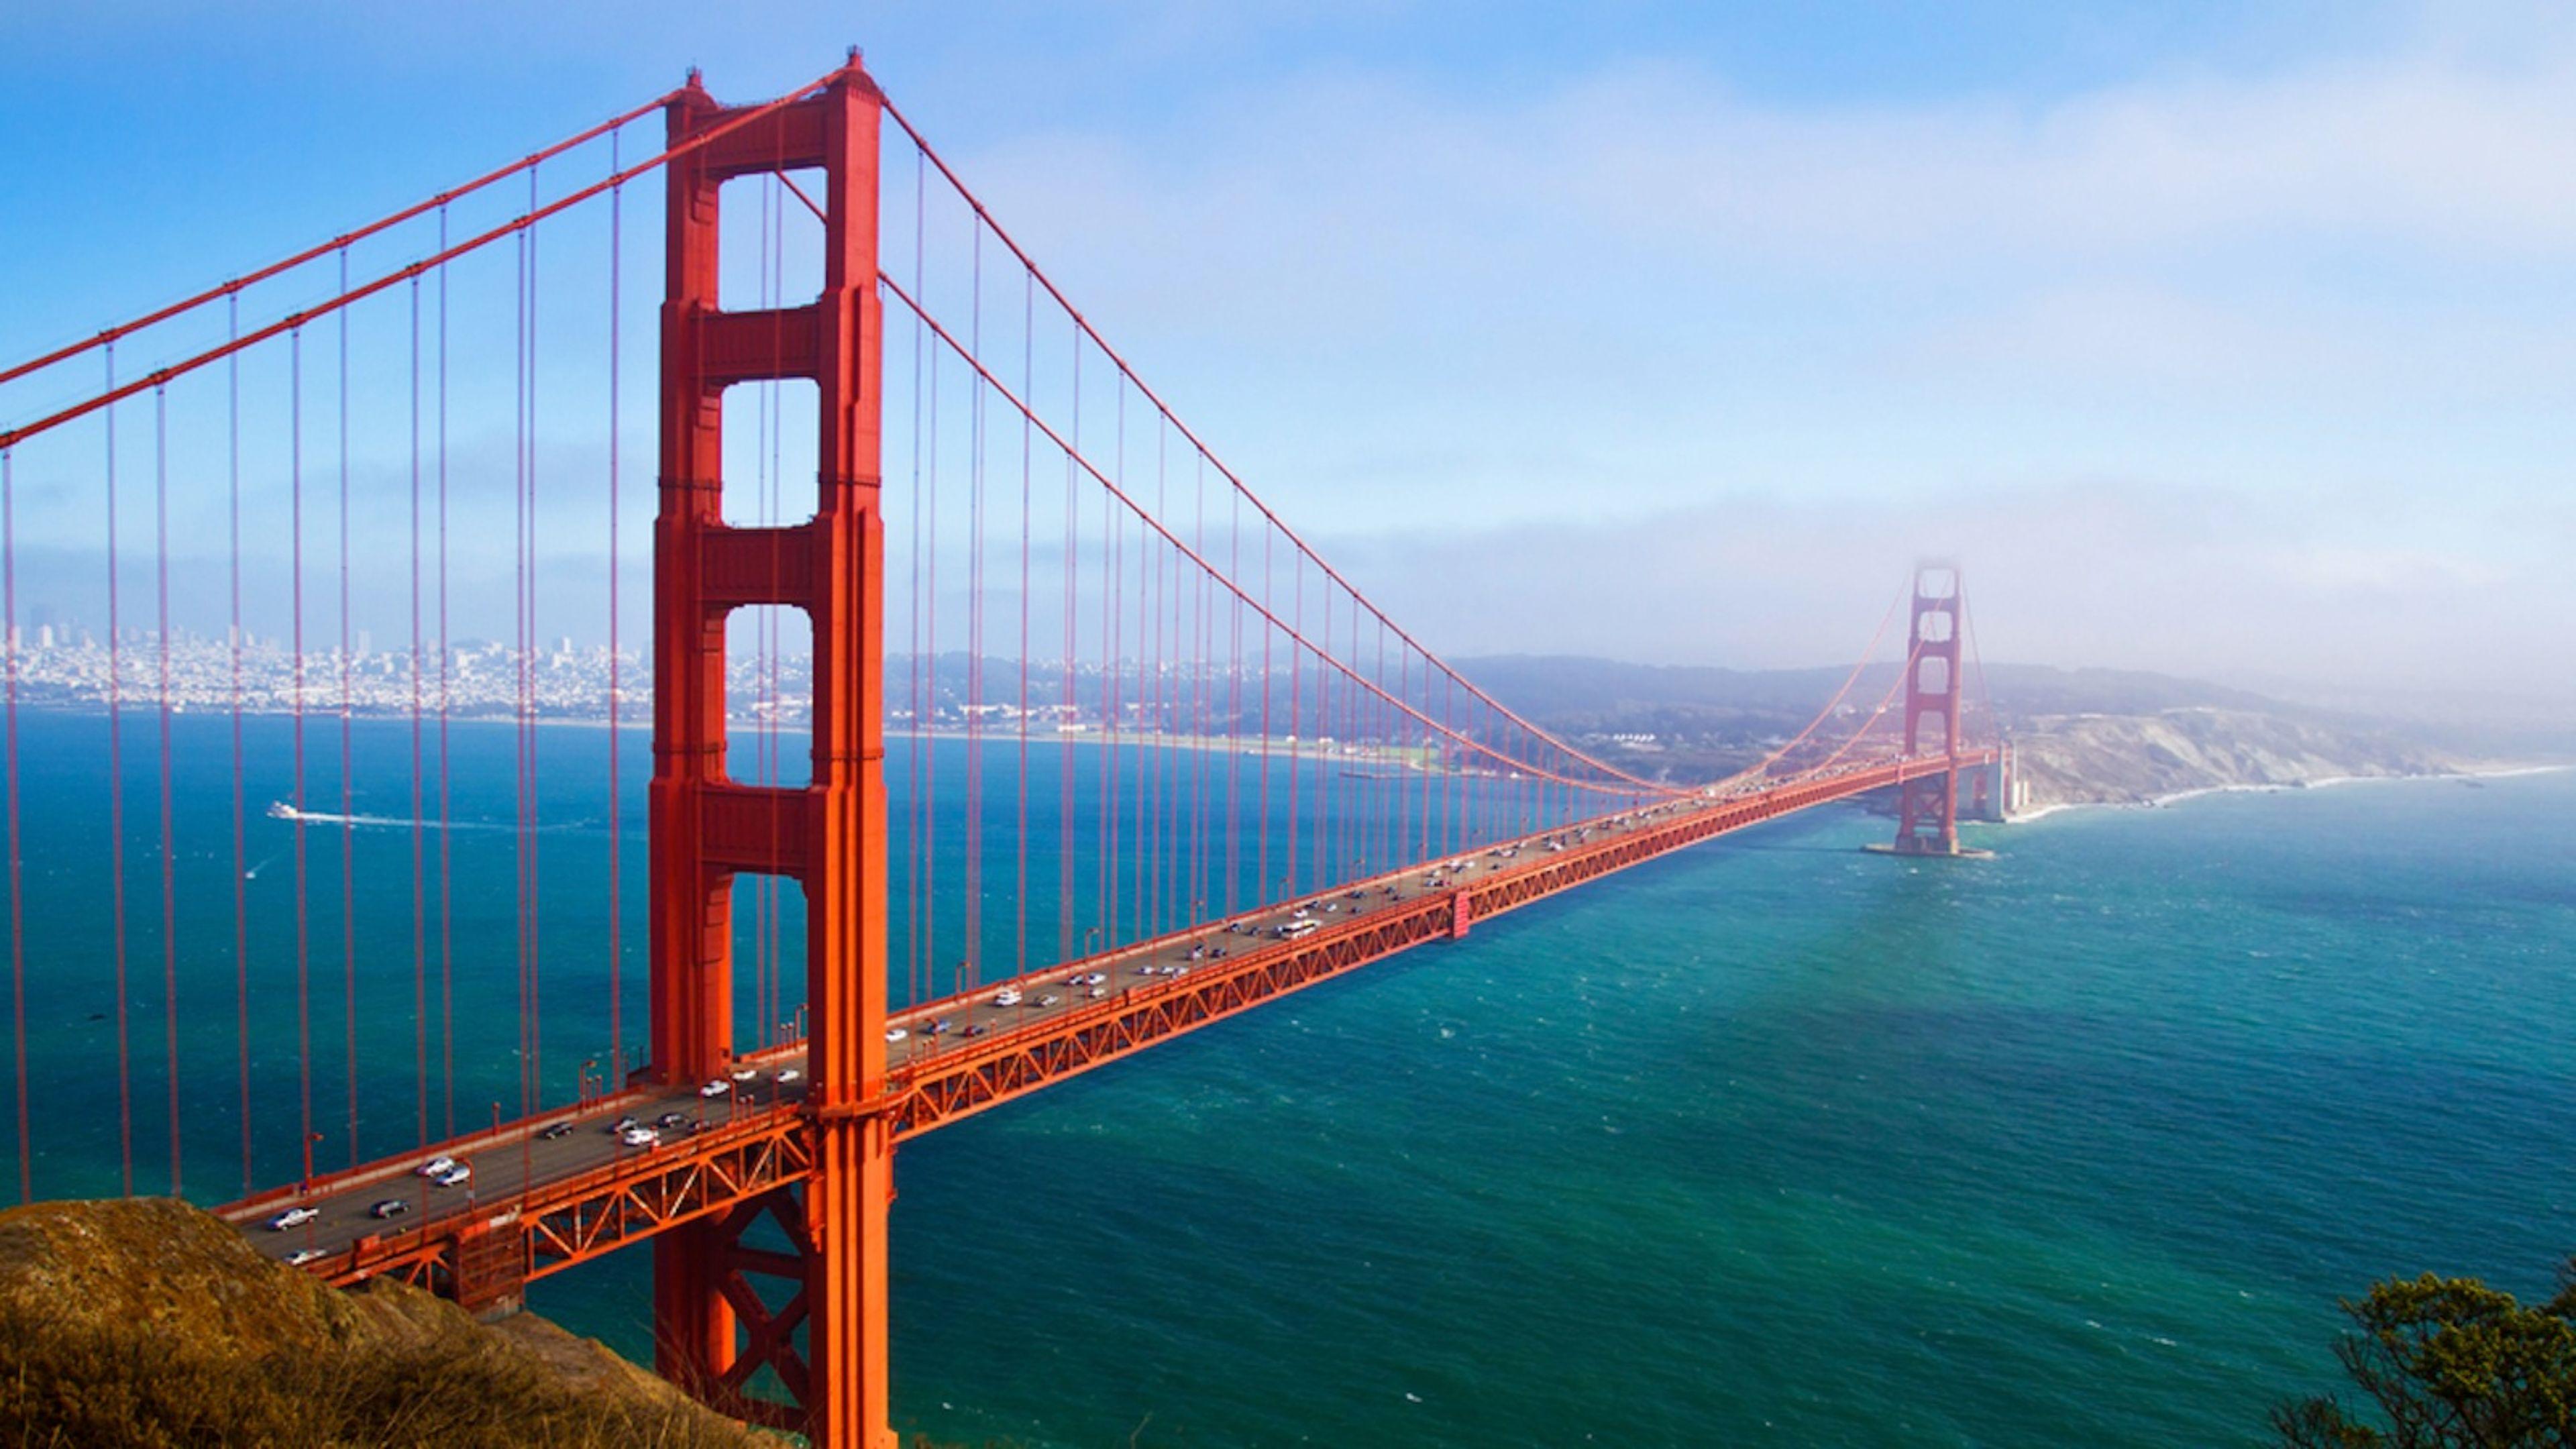 San Francisco Hd Wallpapers Top Free San Francisco Hd Backgrounds